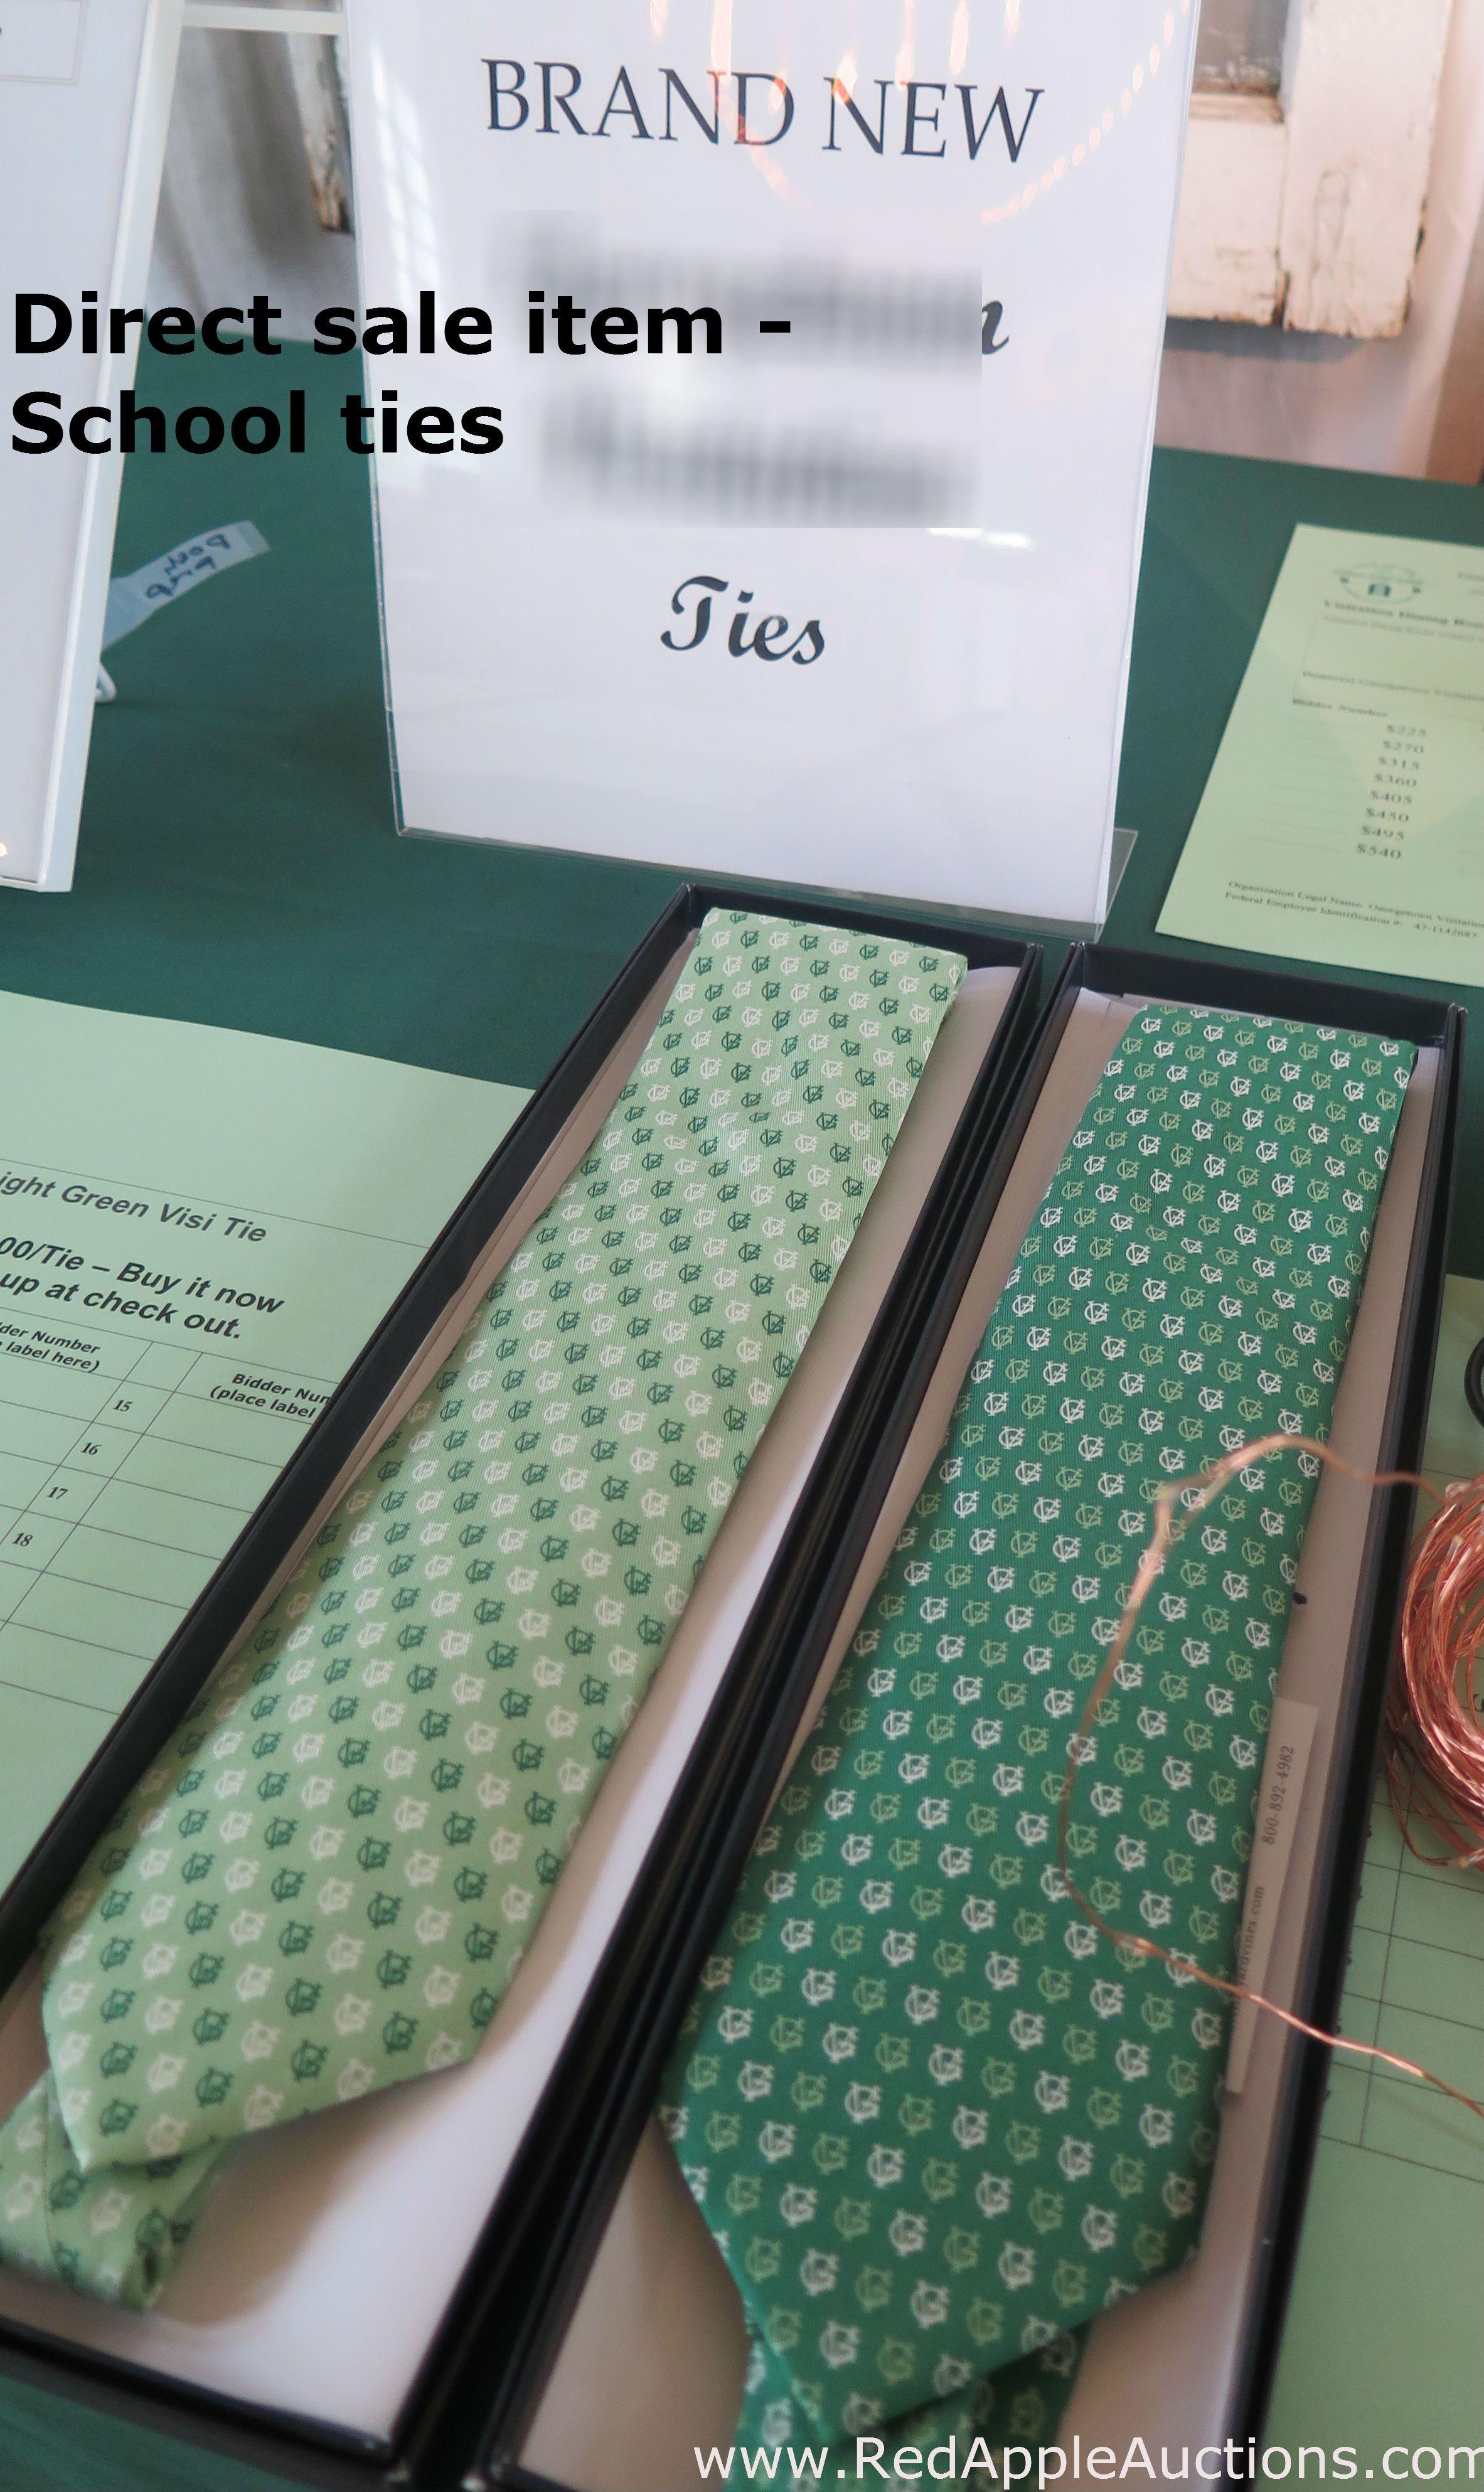 Benefit auction item ideas (With images) Auction items